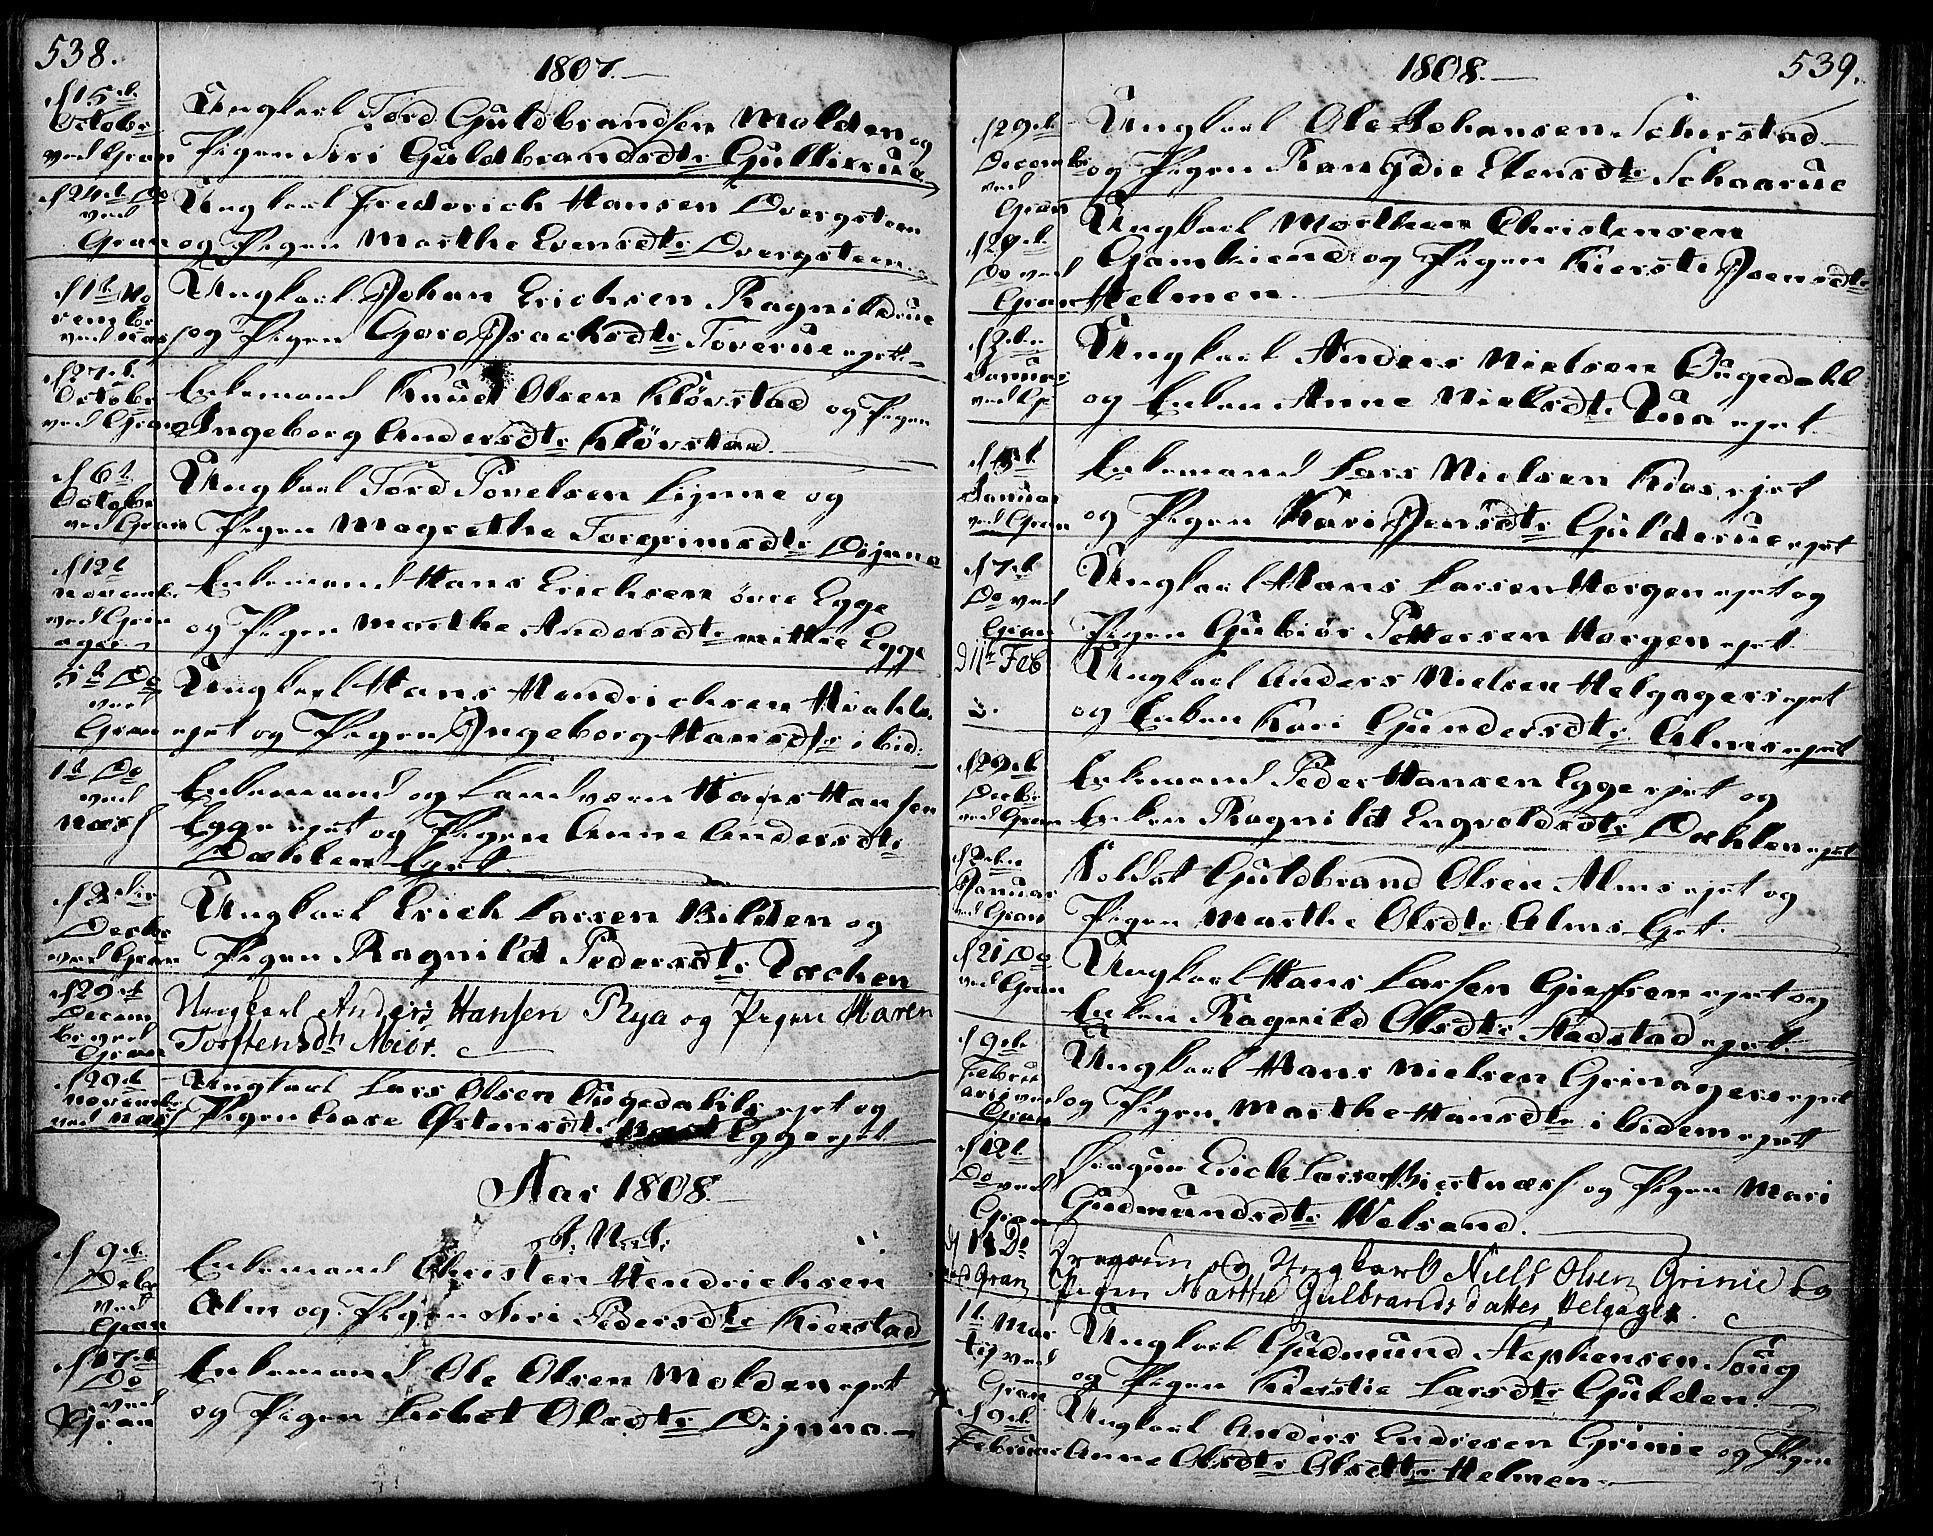 SAH, Gran prestekontor, Ministerialbok nr. 6, 1787-1824, s. 538-539